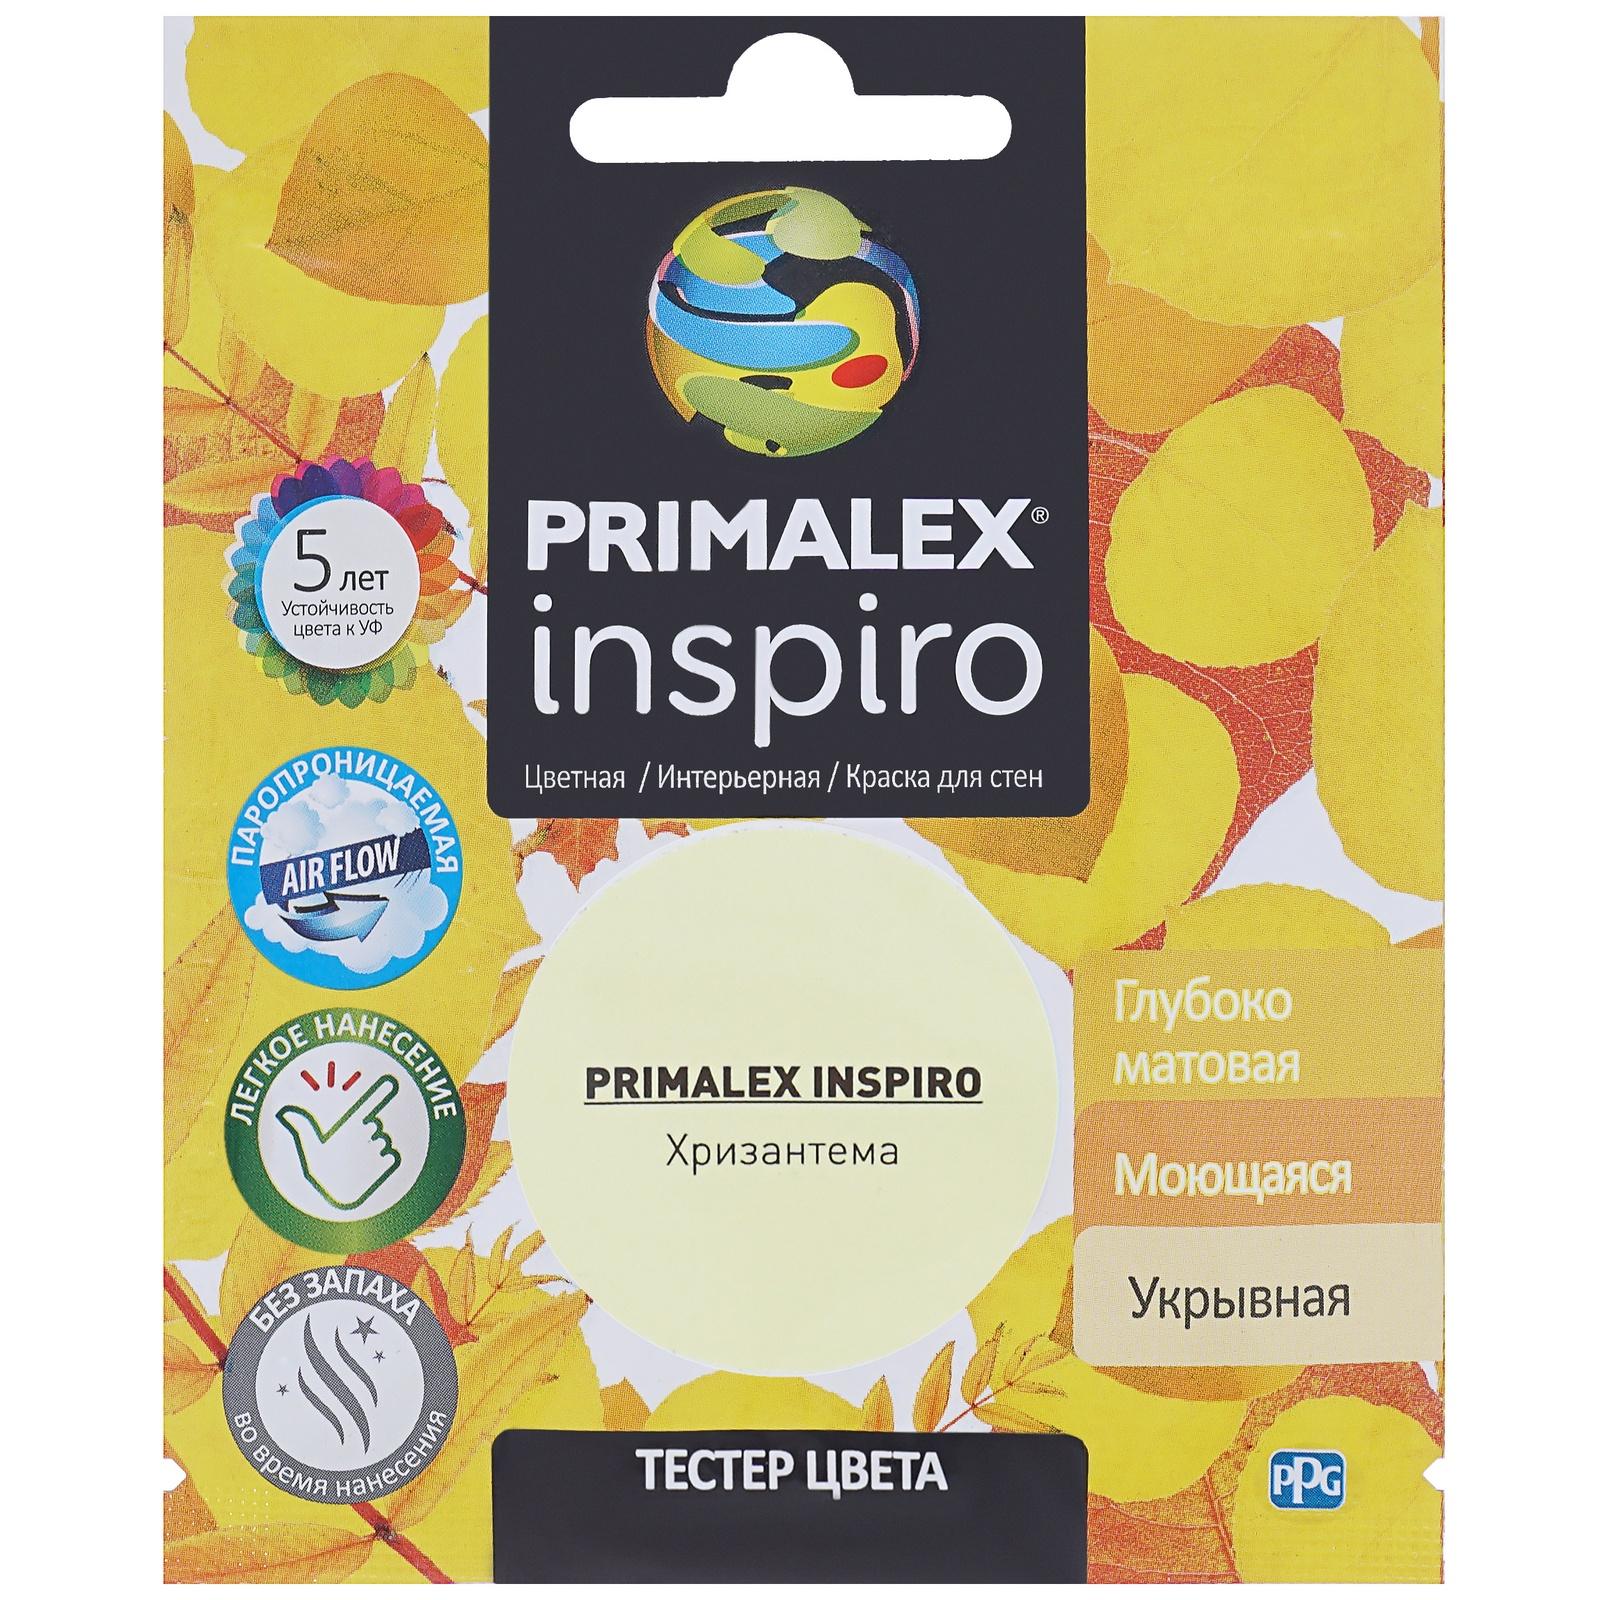 Краска Primalex Inspiro Хризантема 40мл краска ppg primalex inspiro красный мак 40мл pmx i47